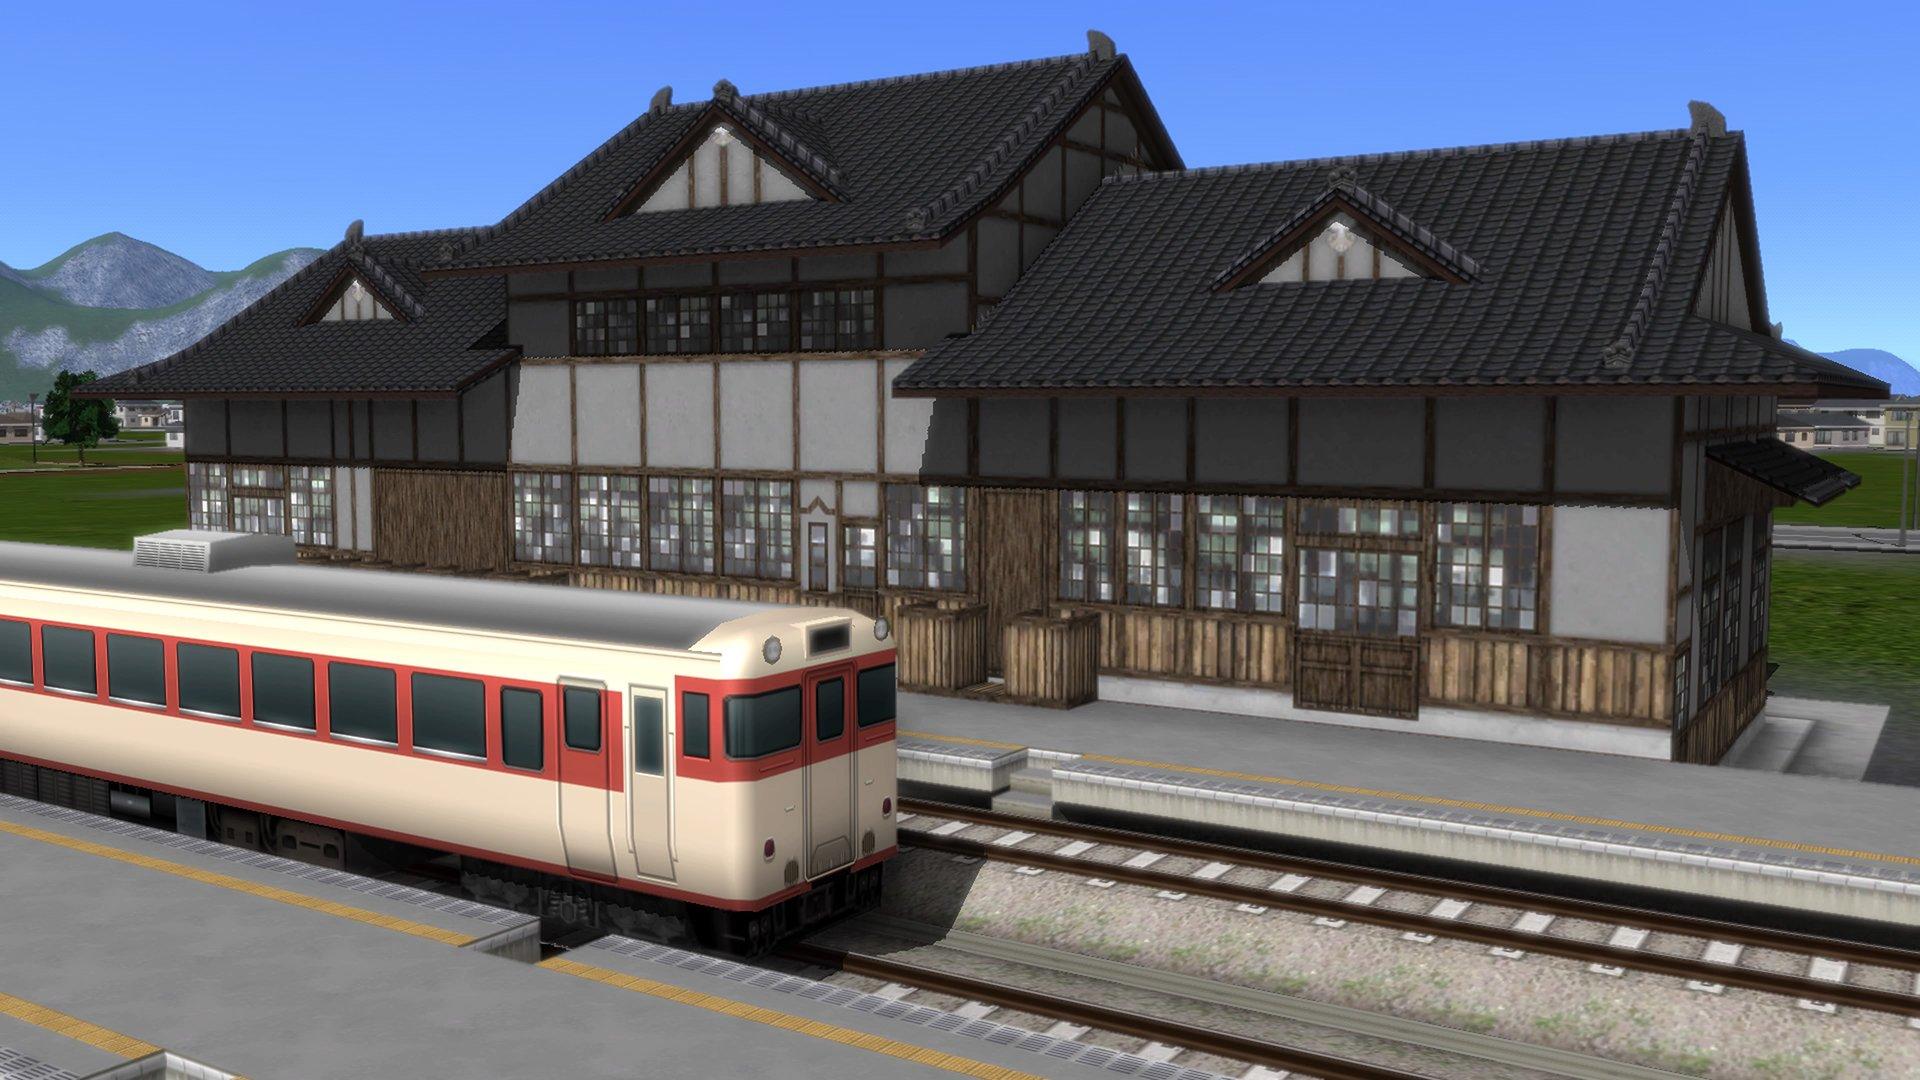 Switch版『A列車で行こう』の発売日はいつ?価格や事前予約などの事前情報